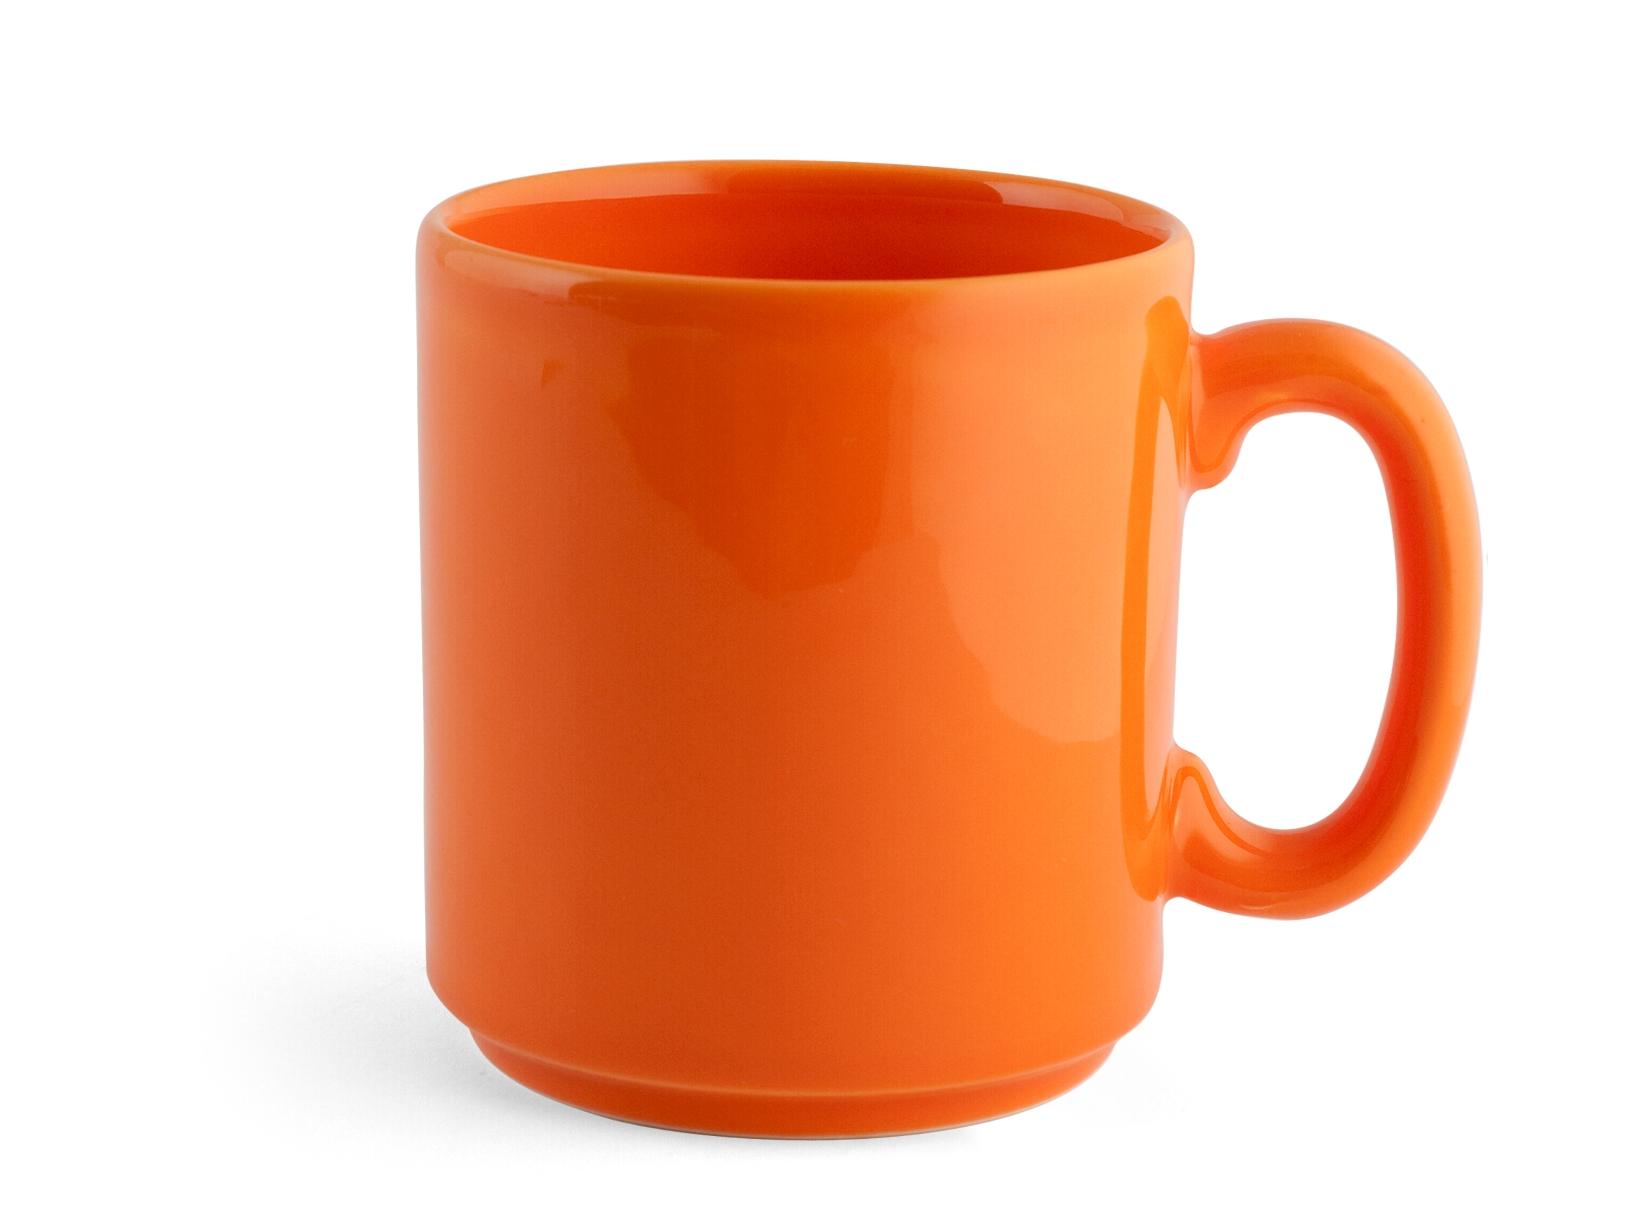 Confezione 6 Mug Ceramica Iris Arancio Cc375